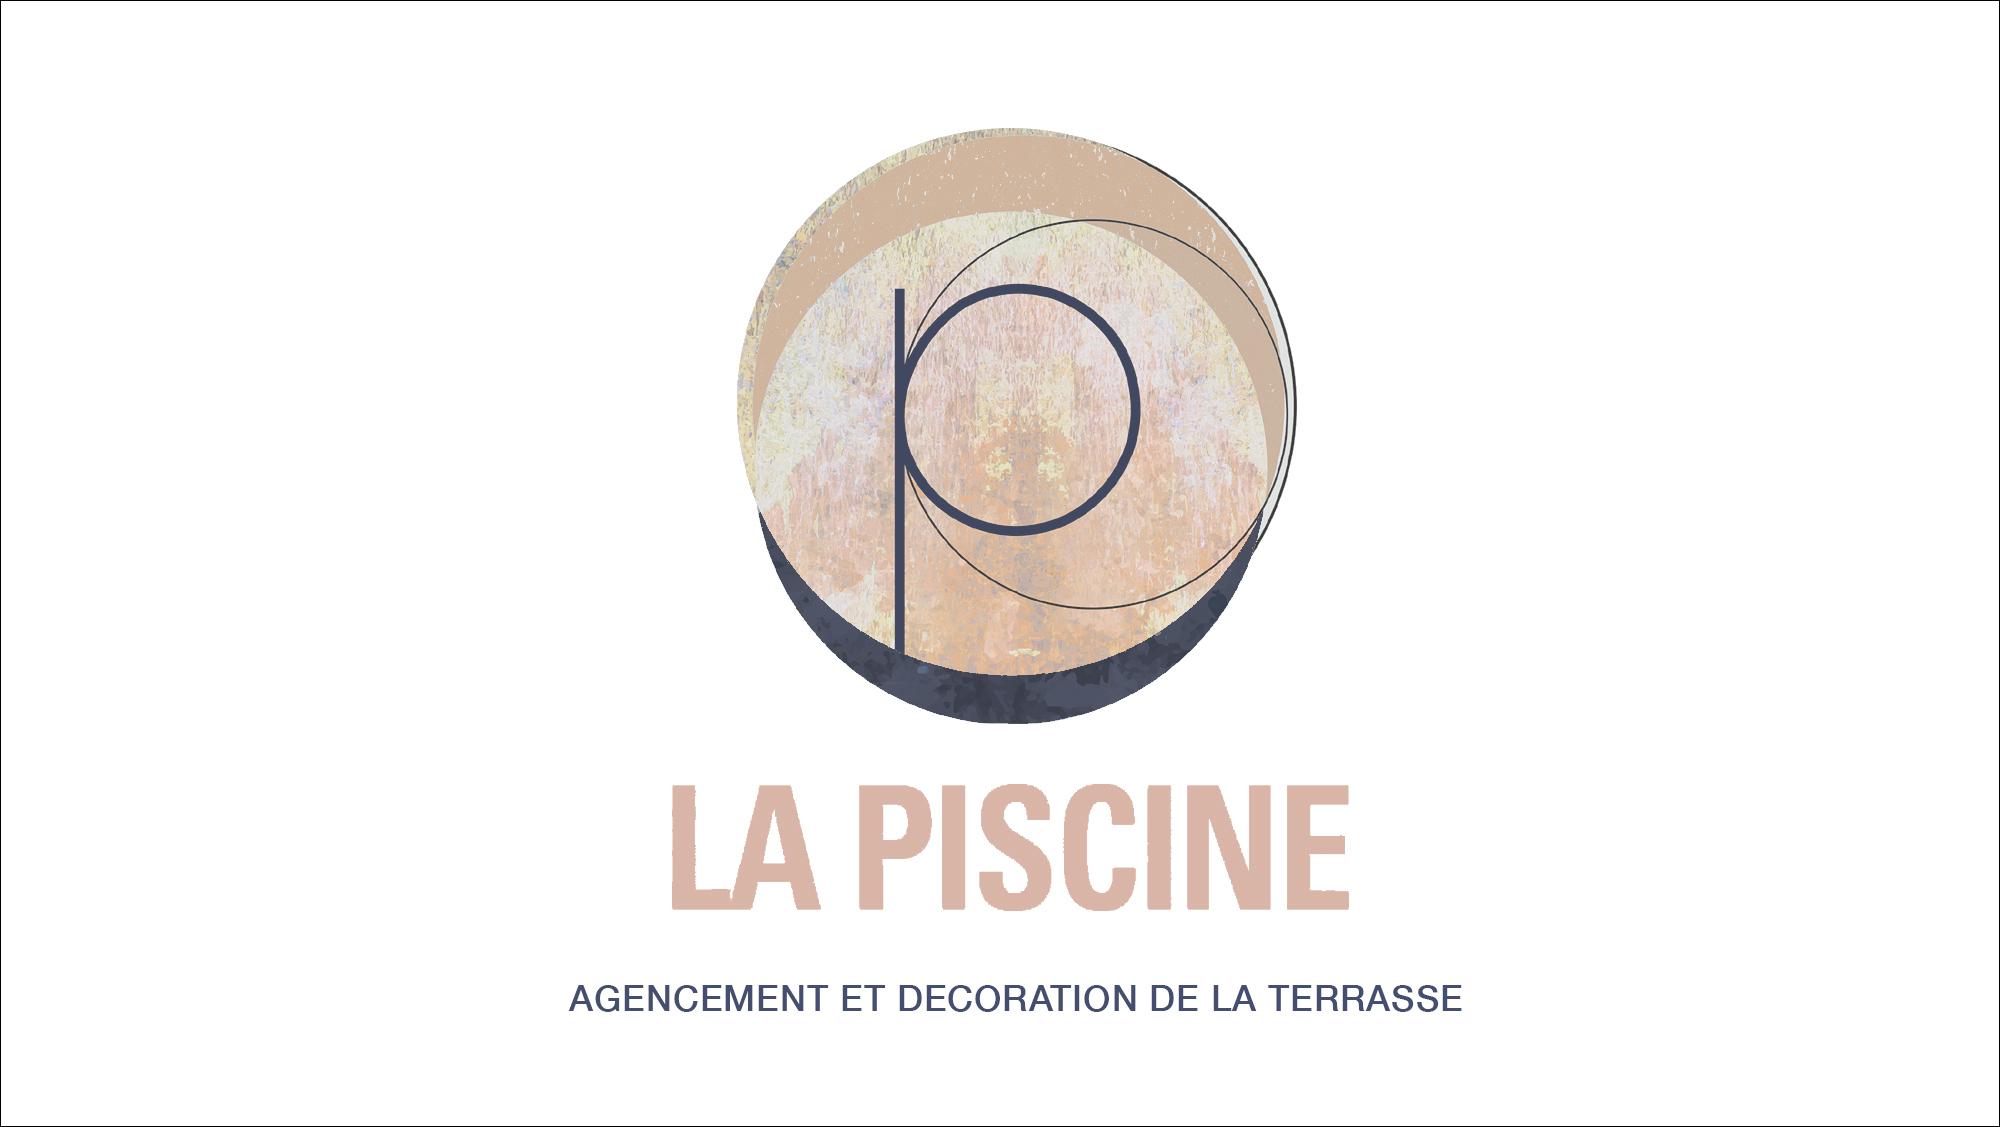 audreyfaugloire-lapiscine-terrasse-1